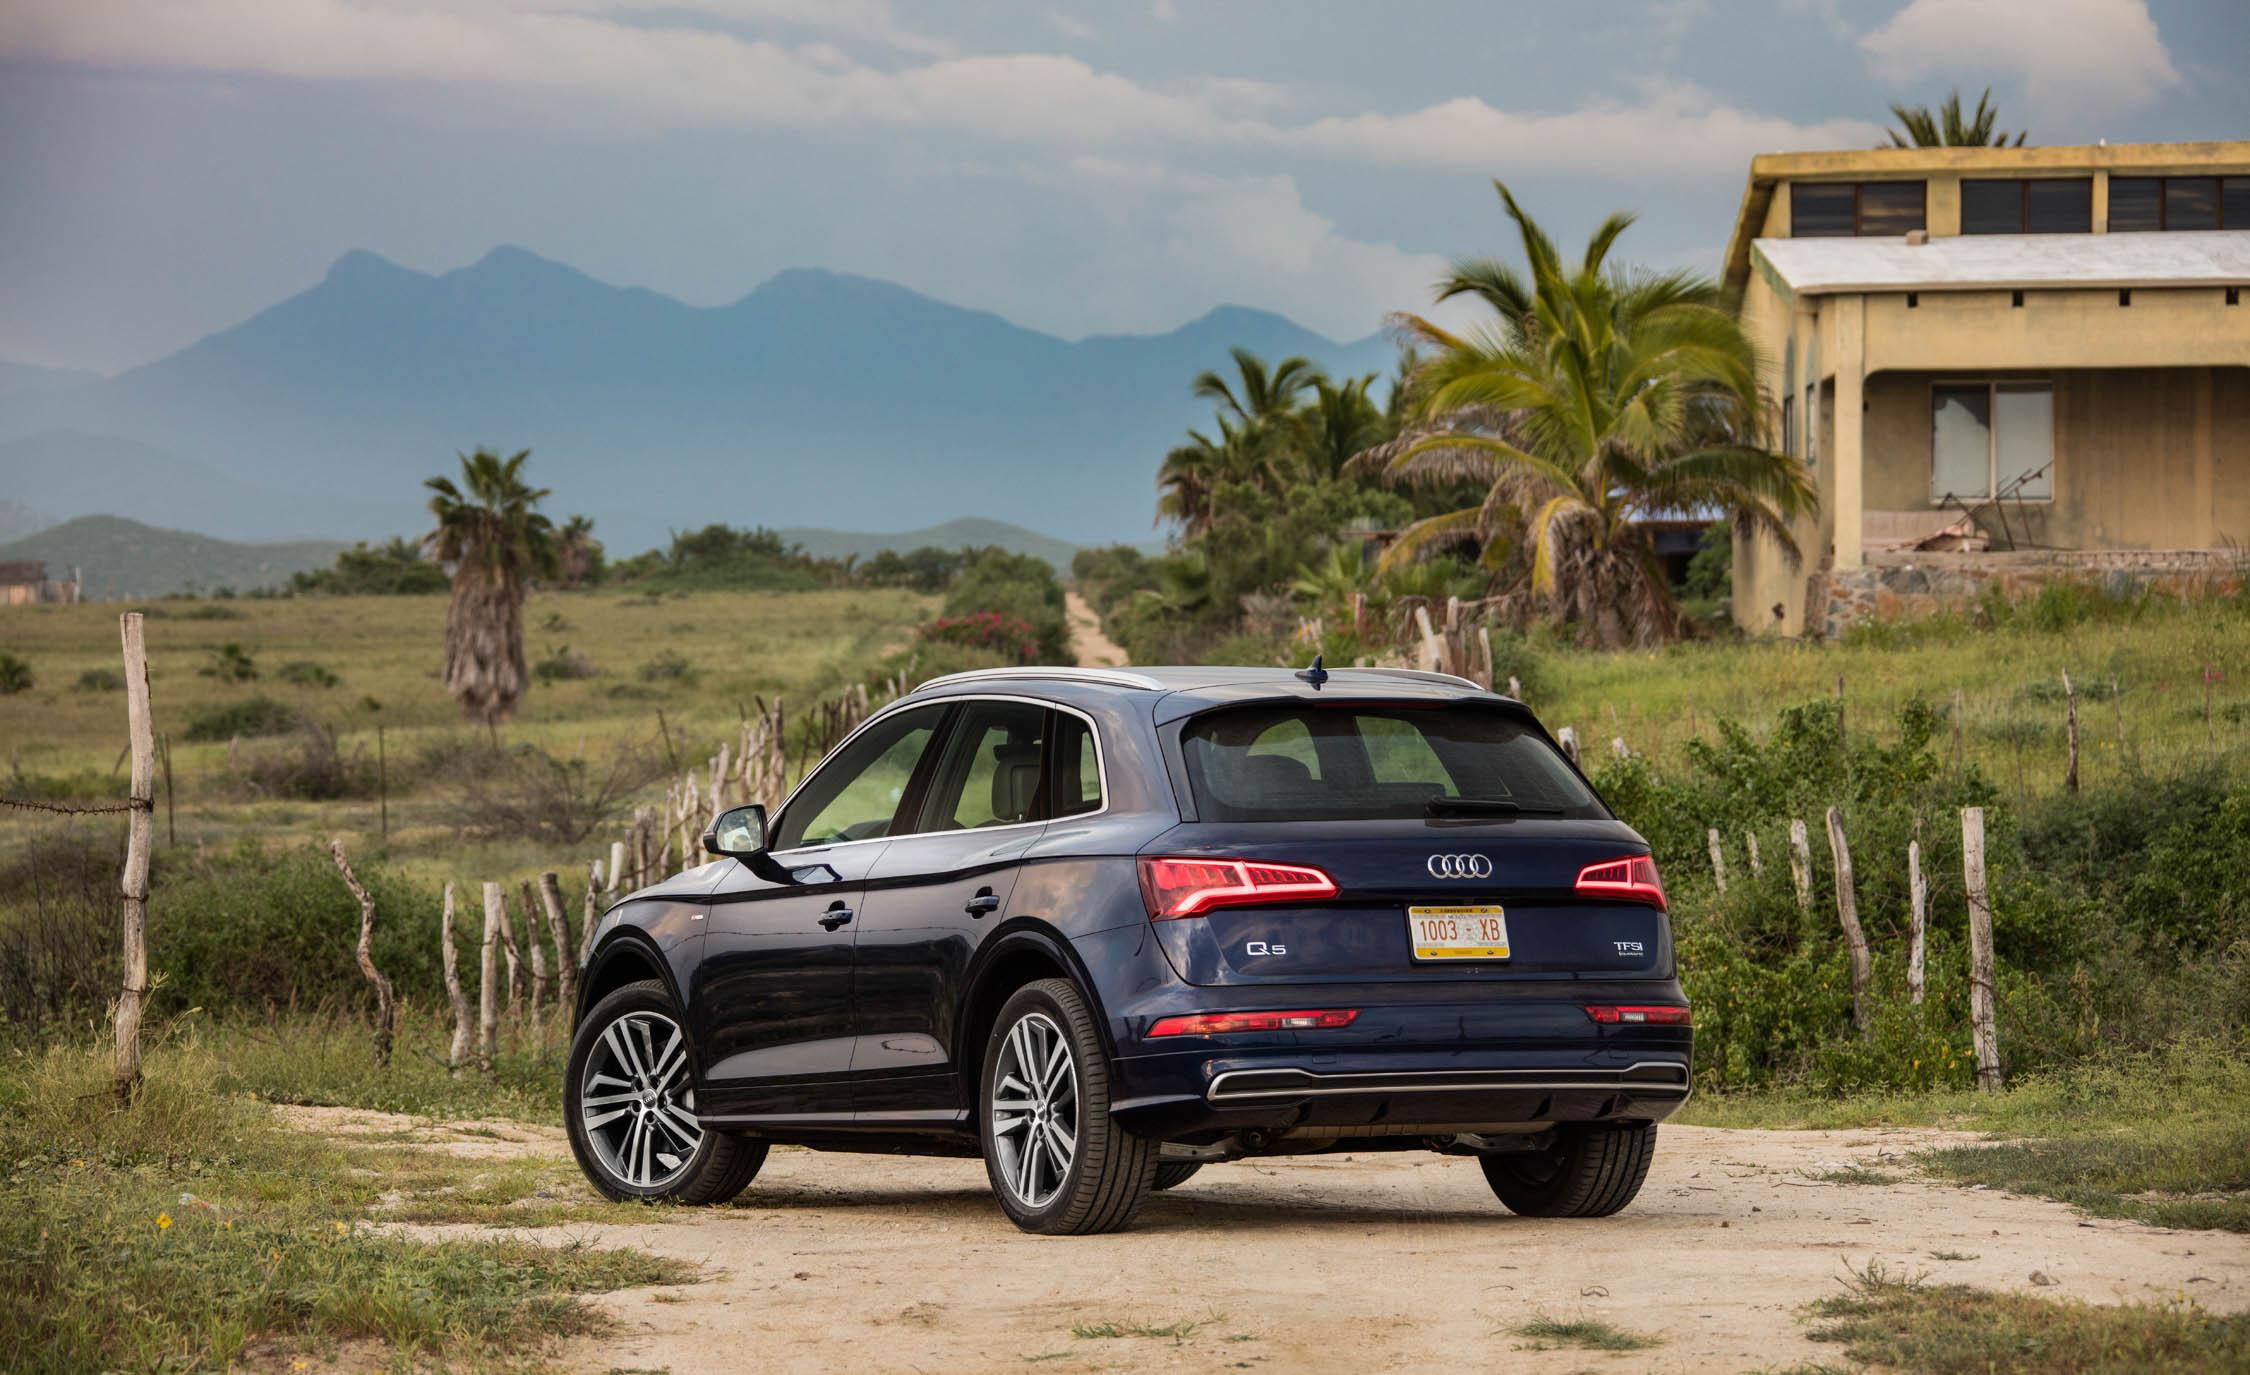 2018 Audi Q (View 29 of 40)